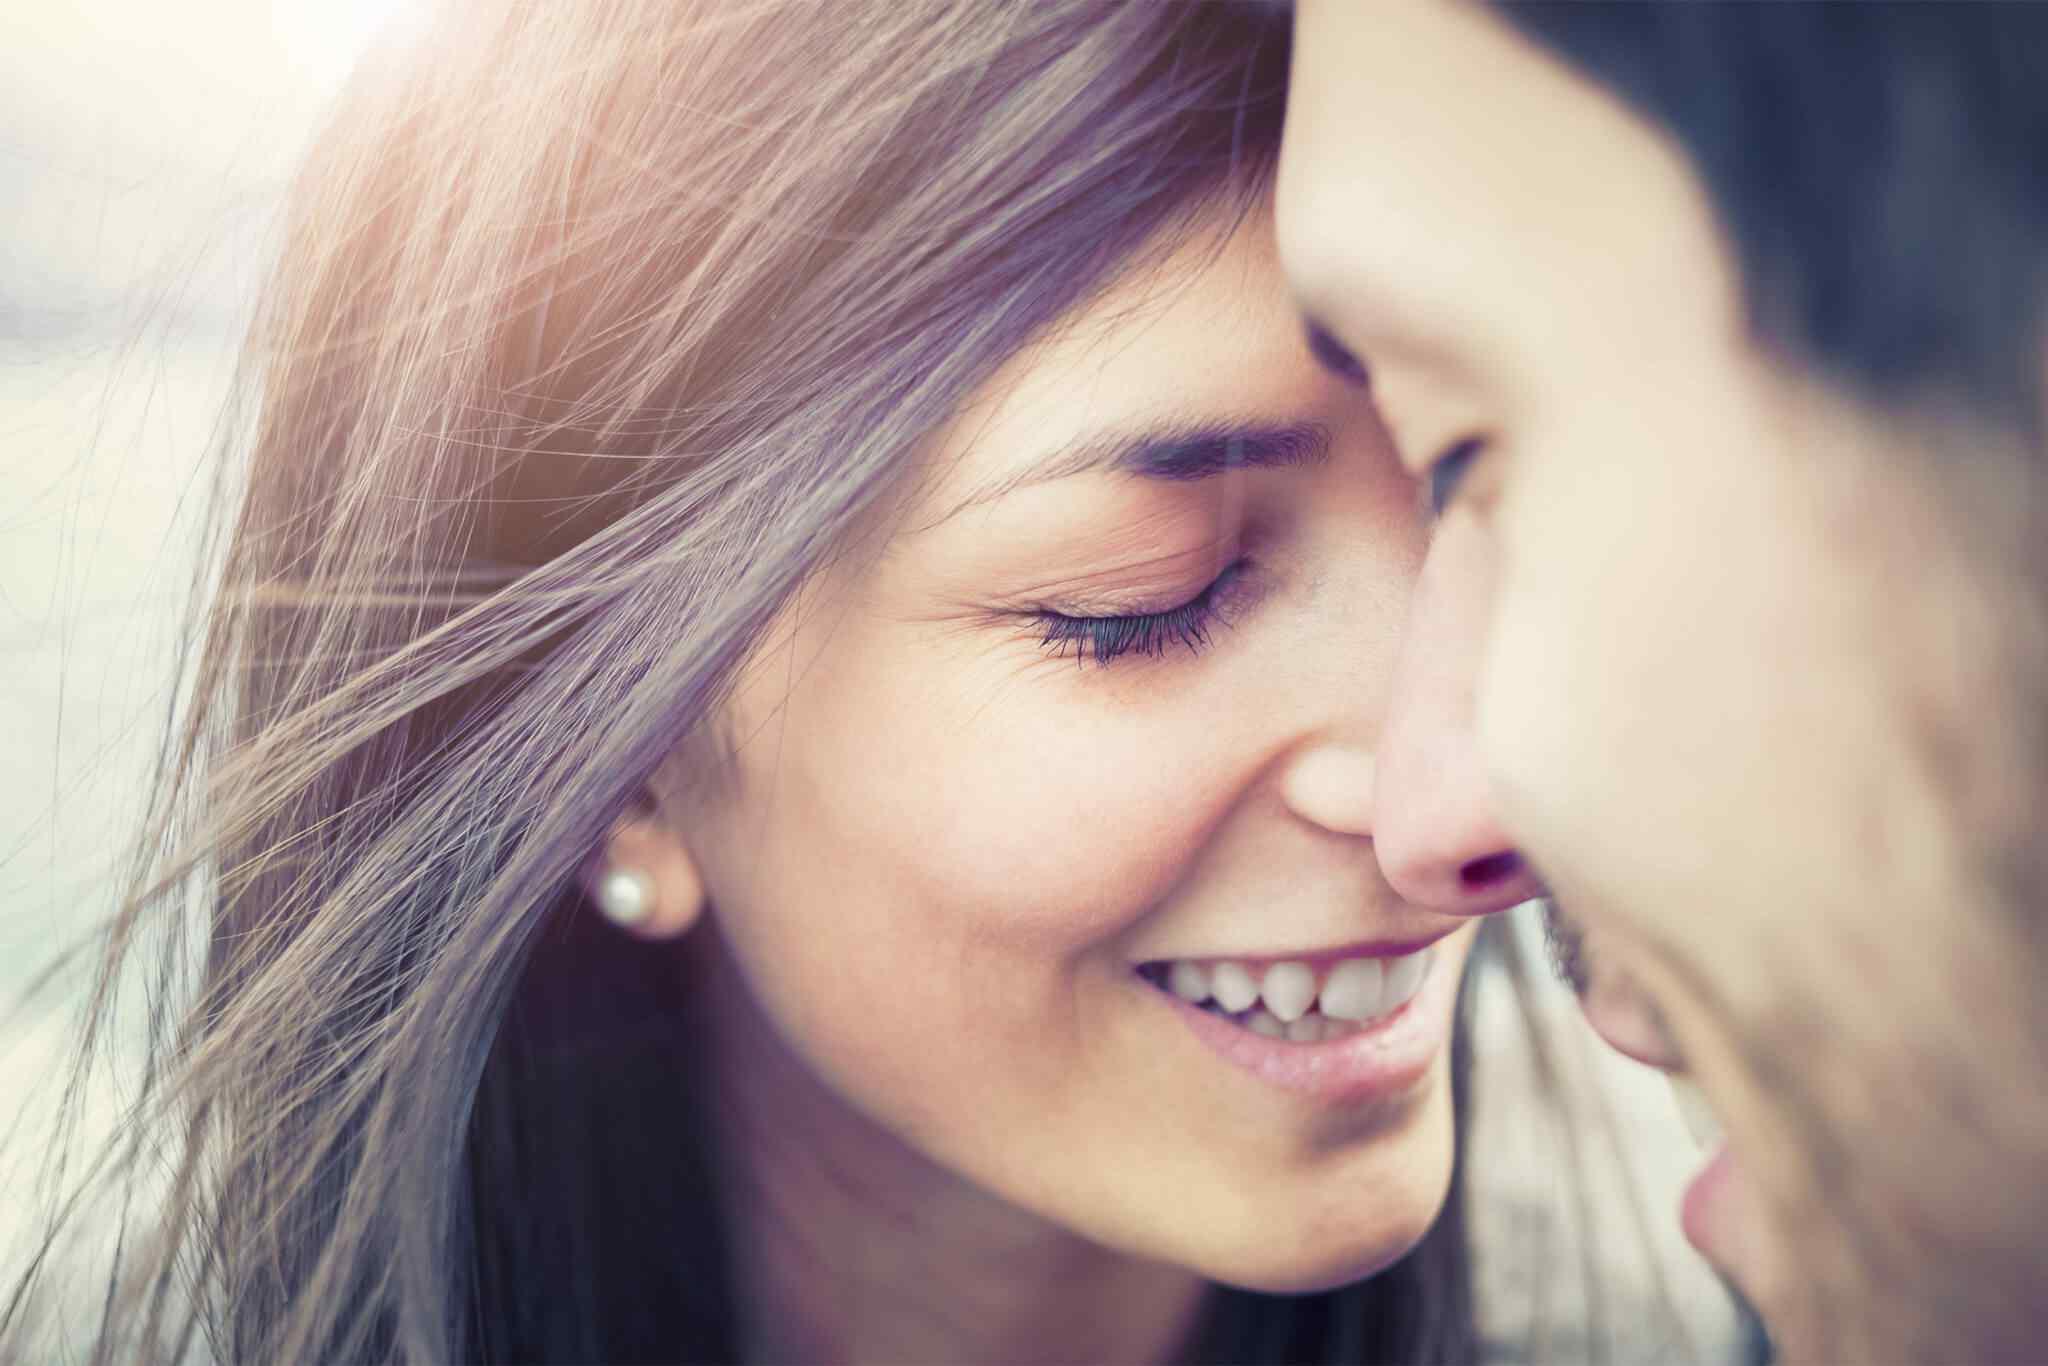 https://www.spiritcoaching.ca/wp-content/uploads/2018/01/img-class-marriage-01.jpg